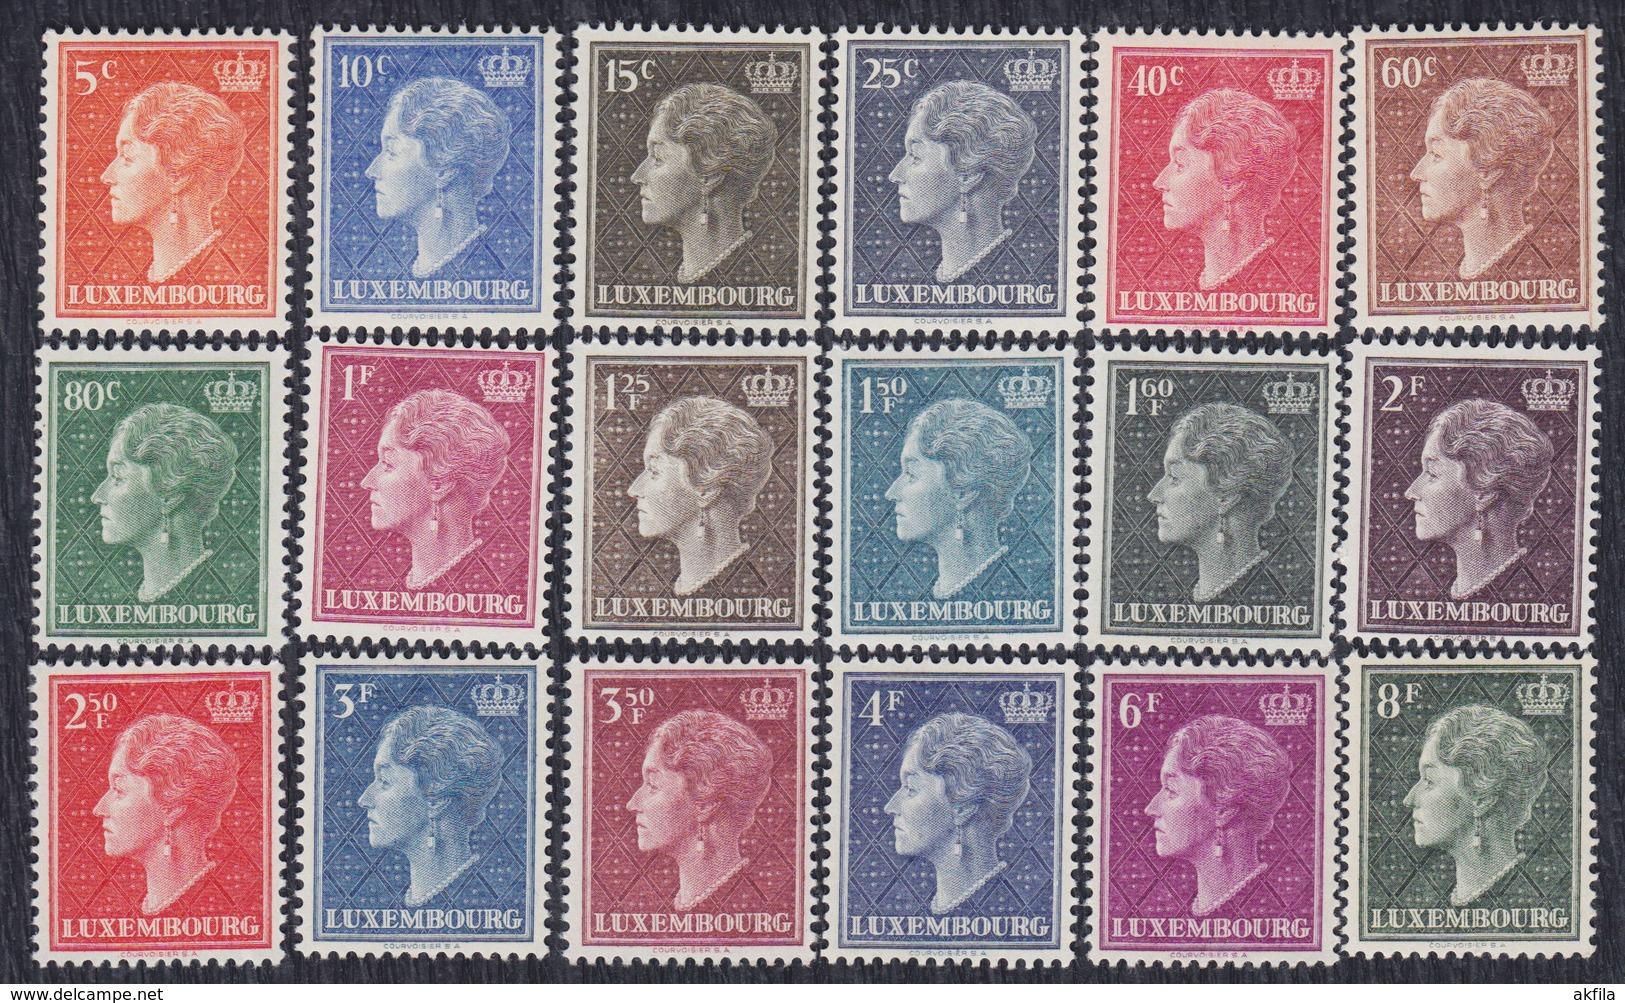 Luxembourg 1948/51 Charlotte, Grand Duchess Of Luxembourg, MNH (**) Michel 442-459 - Luxembourg